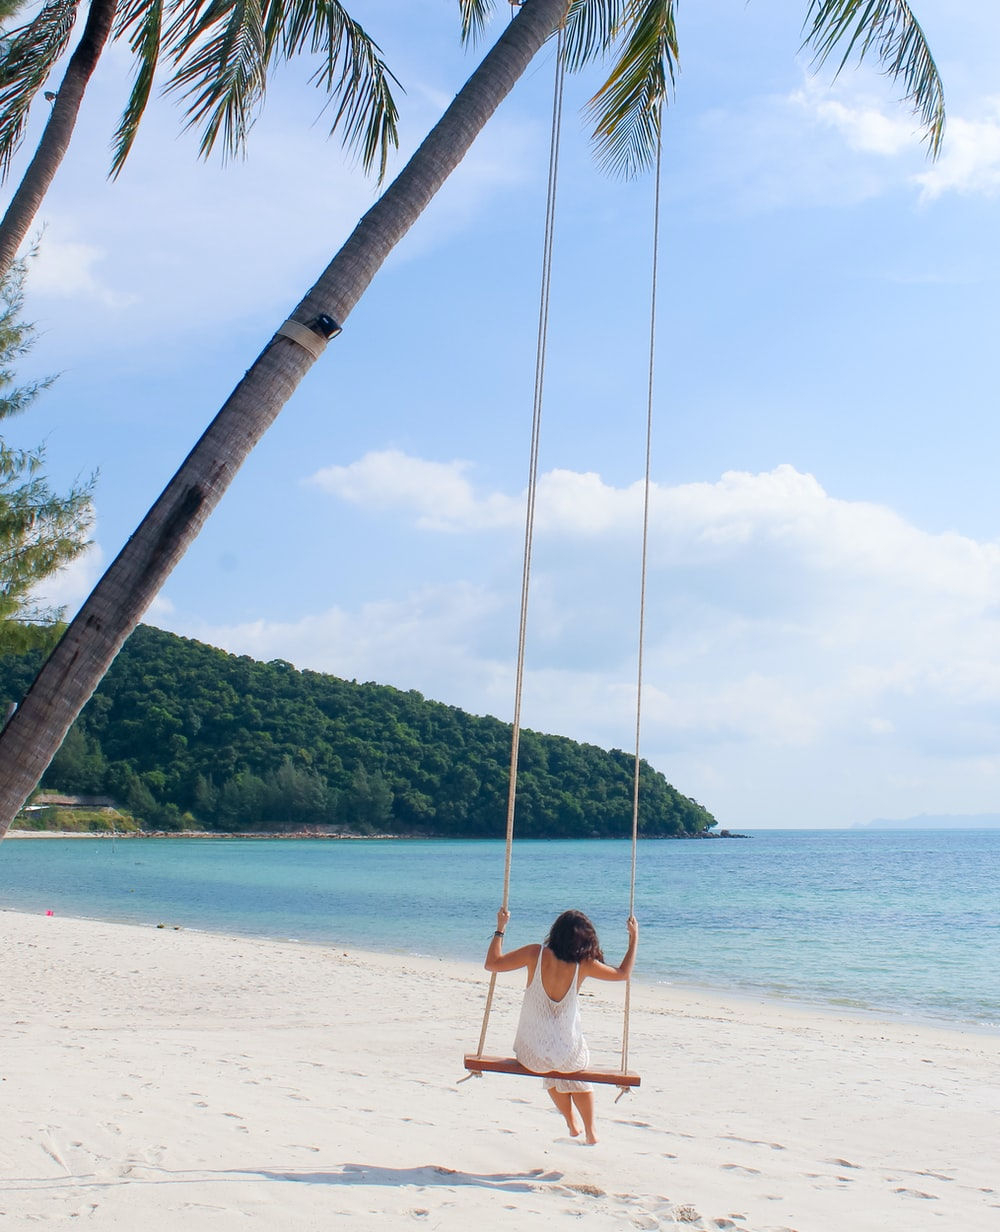 woman wearing white dress sitting on the swing